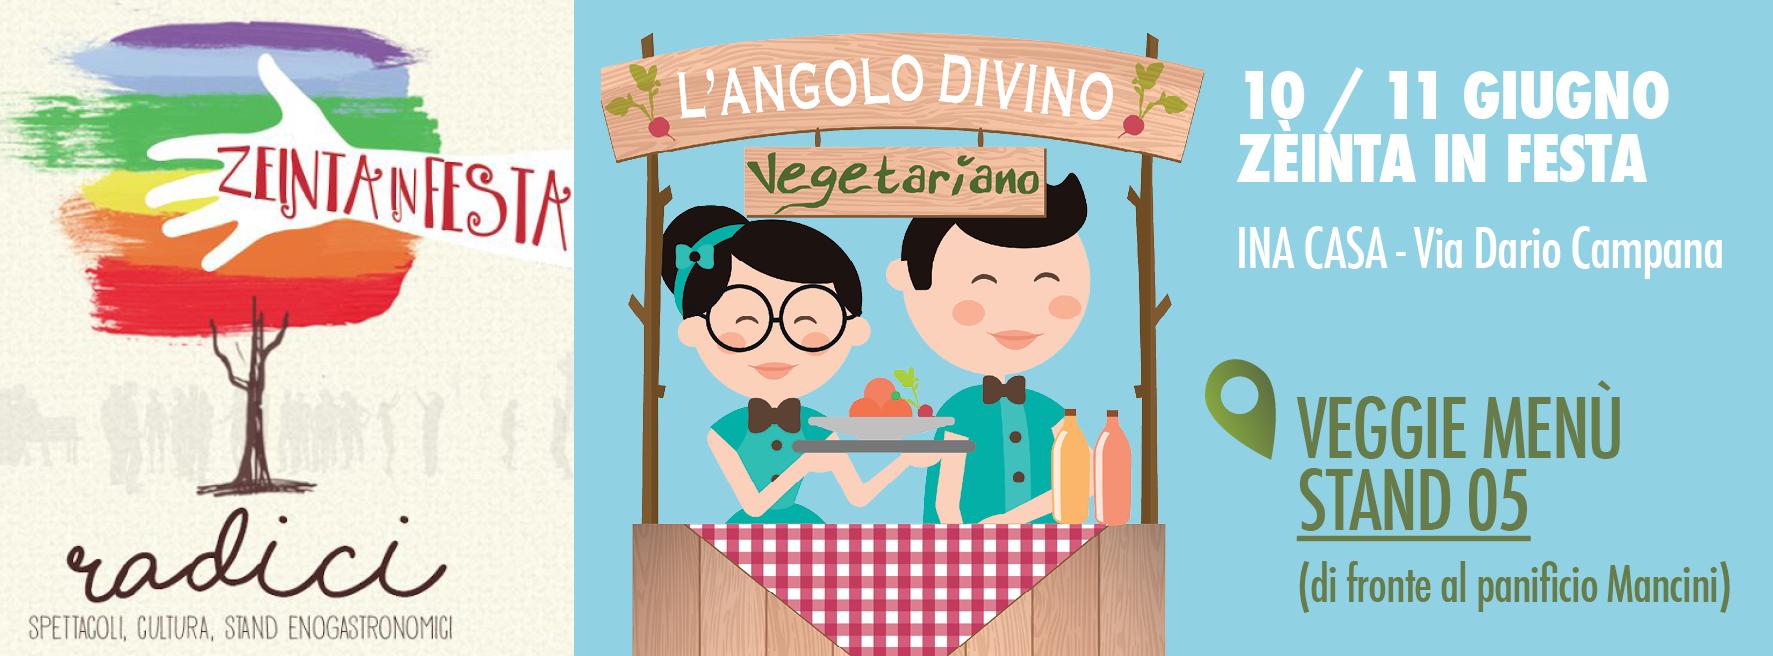 street food vegetariano